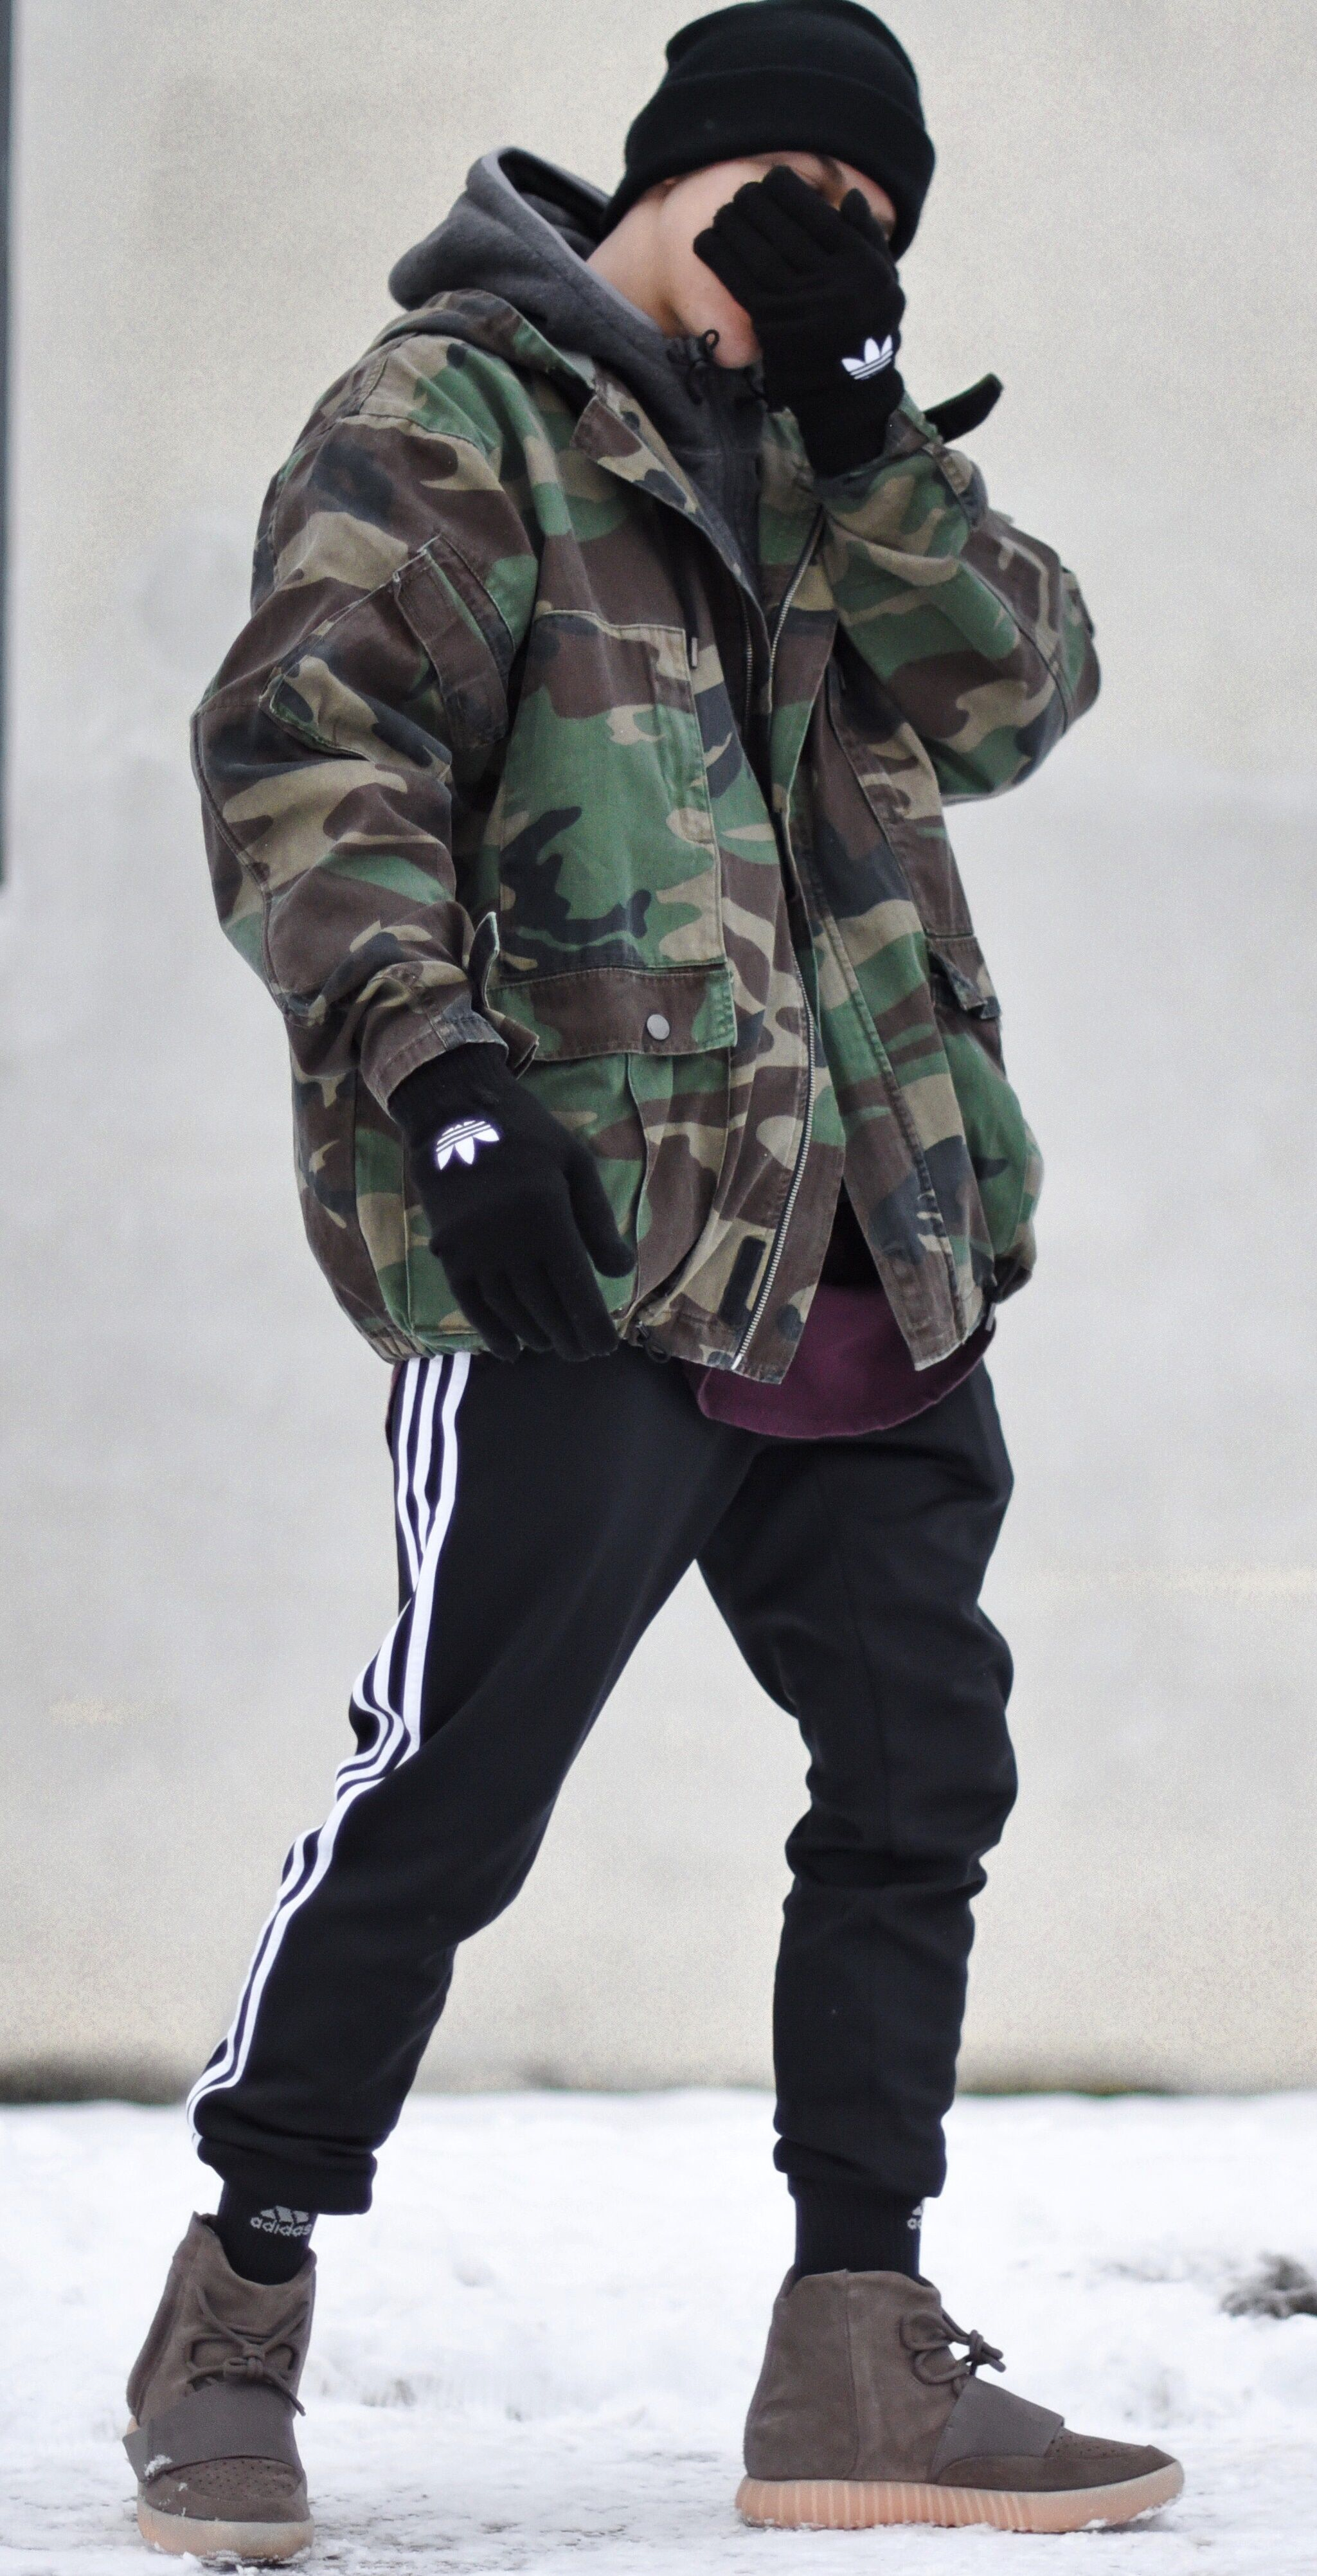 d5c38b54afc135 Urban Fashion Adidas Track Pants Mens